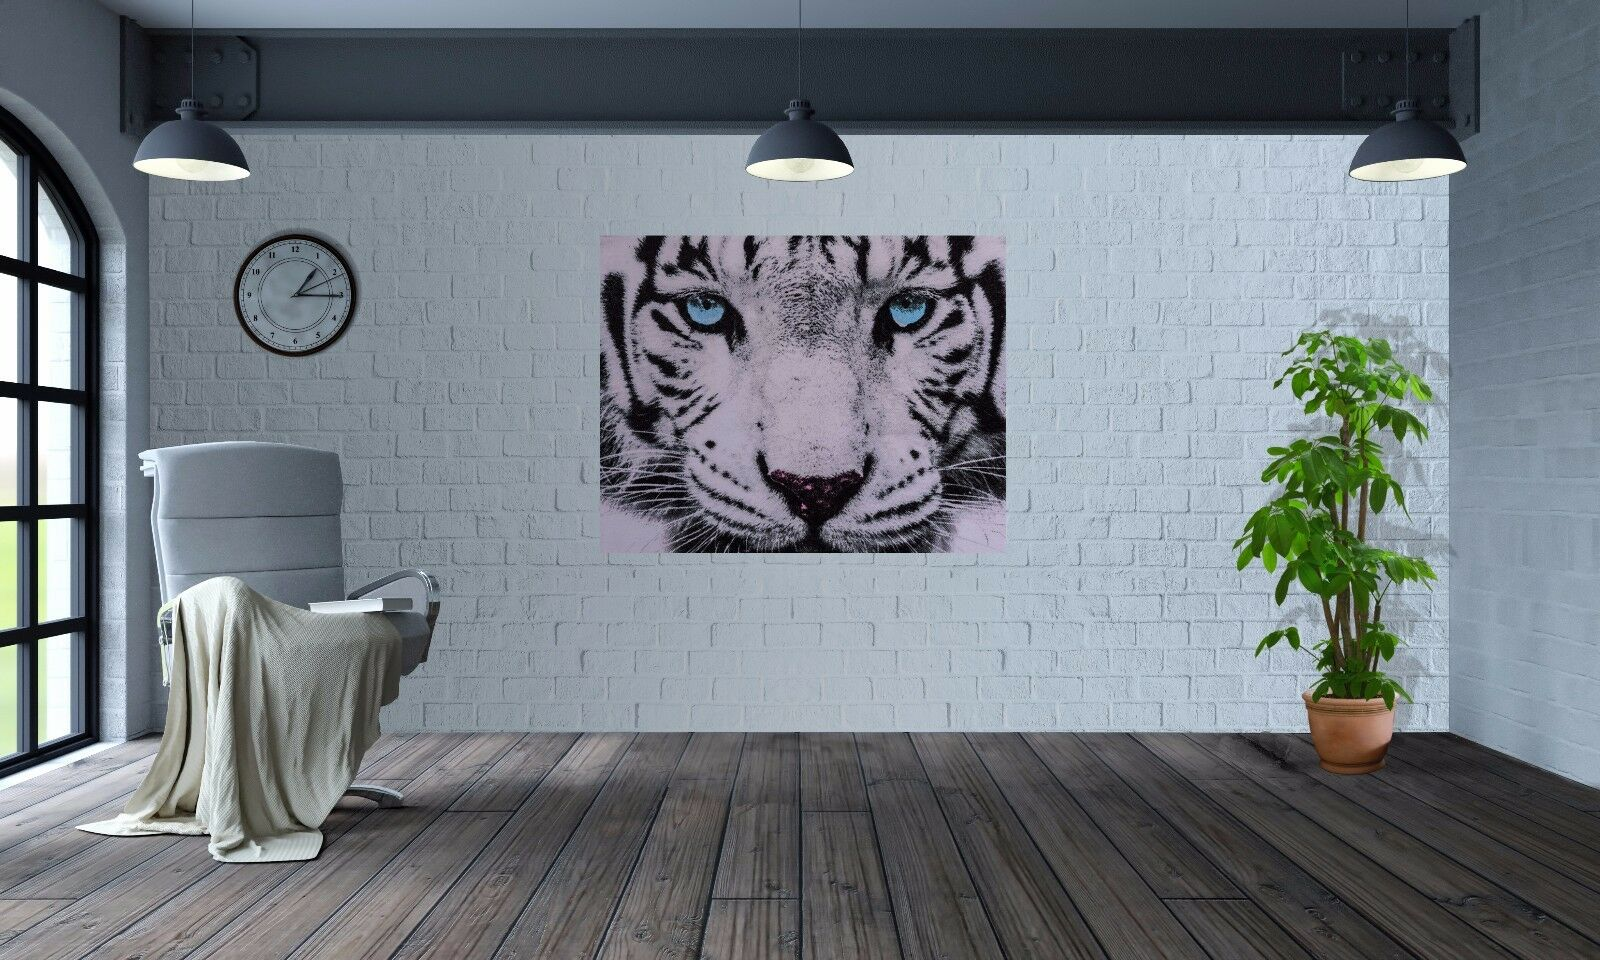 Stunning Close up Weiß tiger tiger tiger Blau eyes wallpaper wall mural (37480445) 99e79b